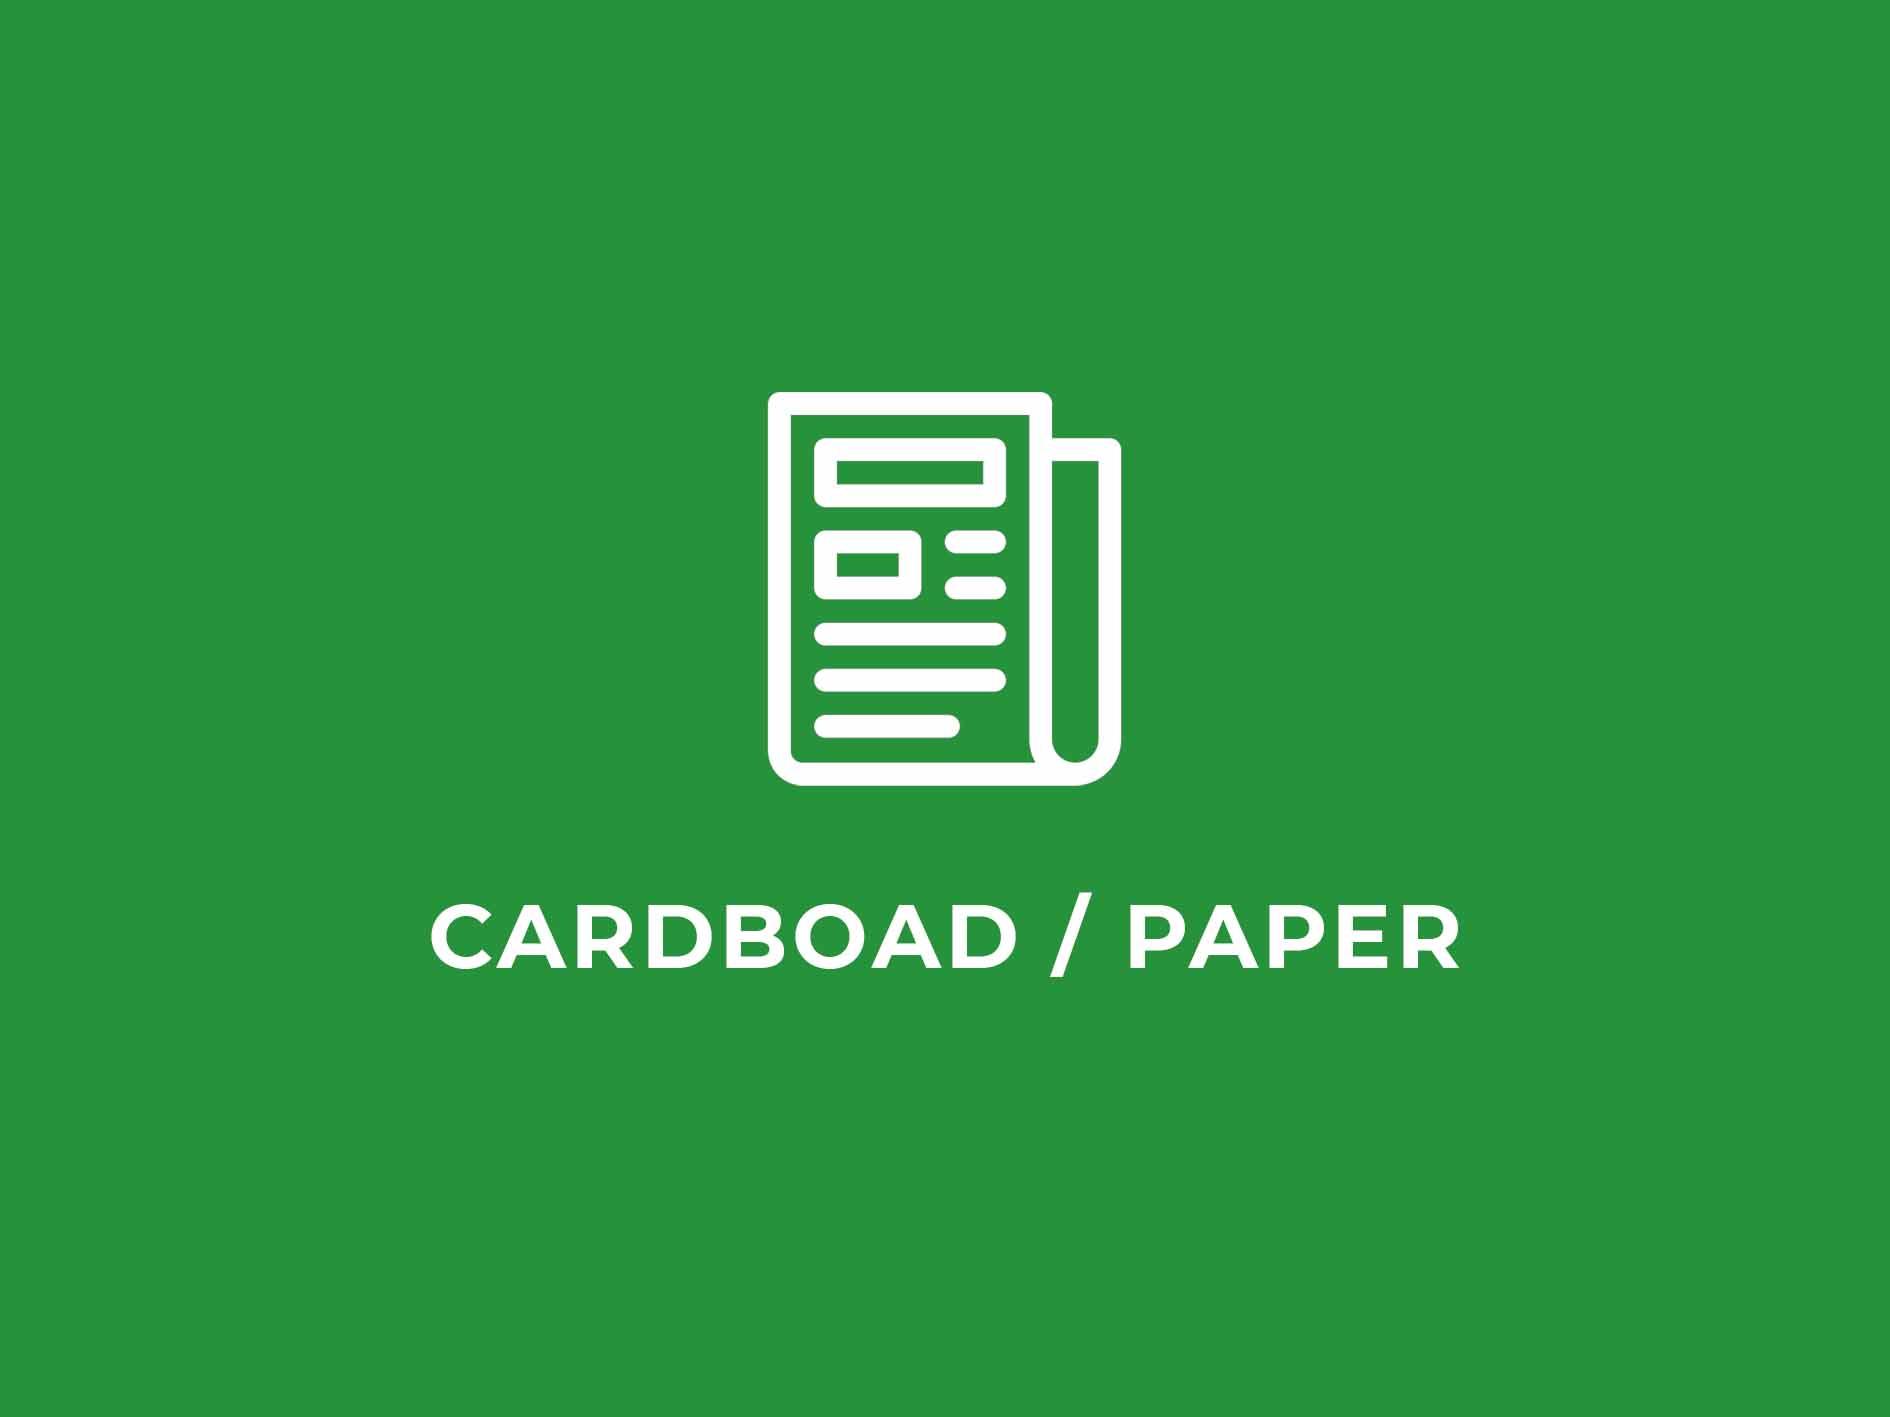 illustration of newspaper on green background